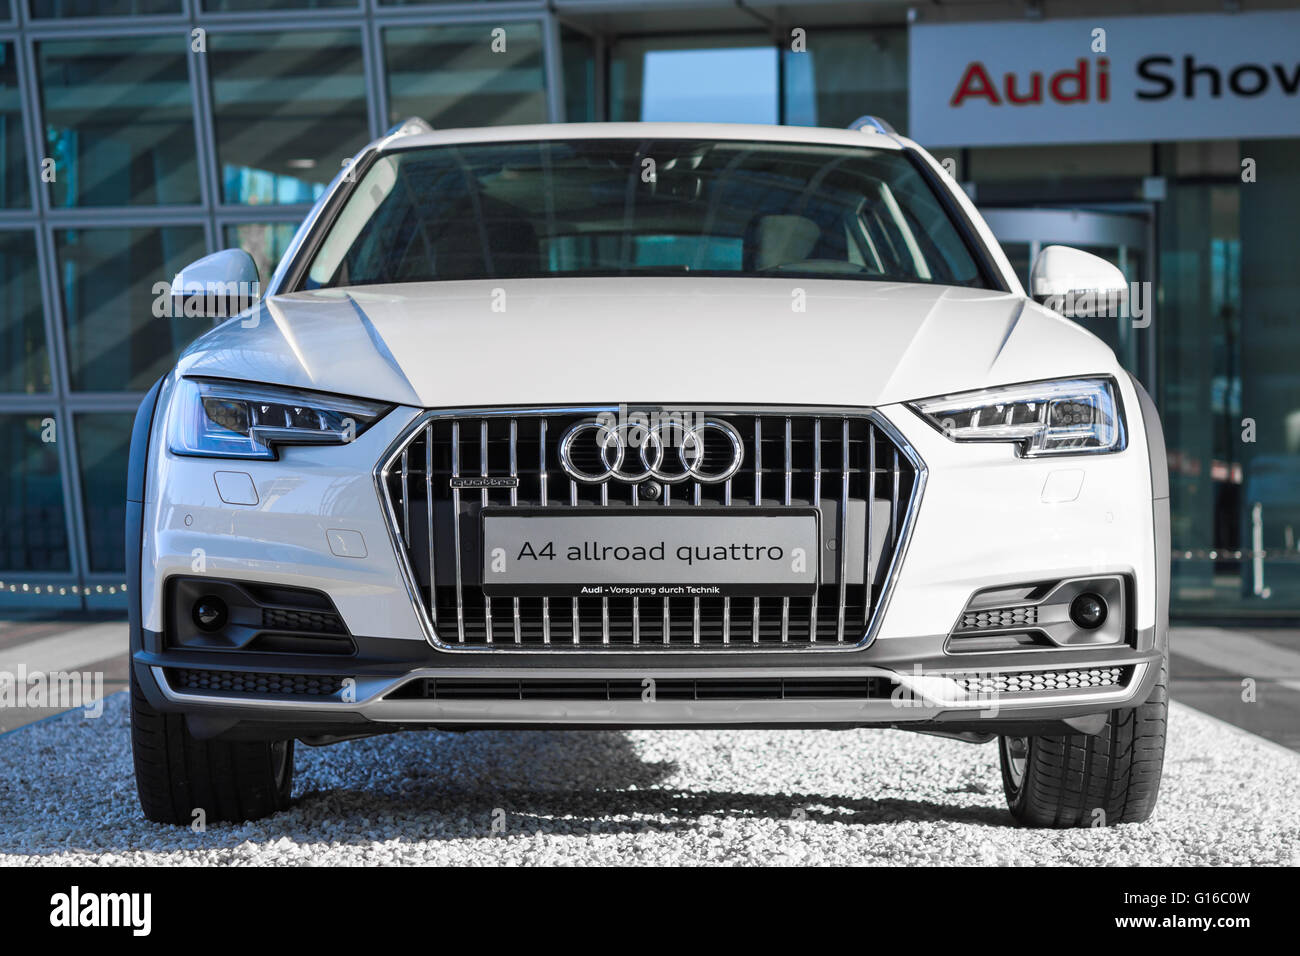 Audi A4 allroad quattro is new modern SUV car model with four wheel